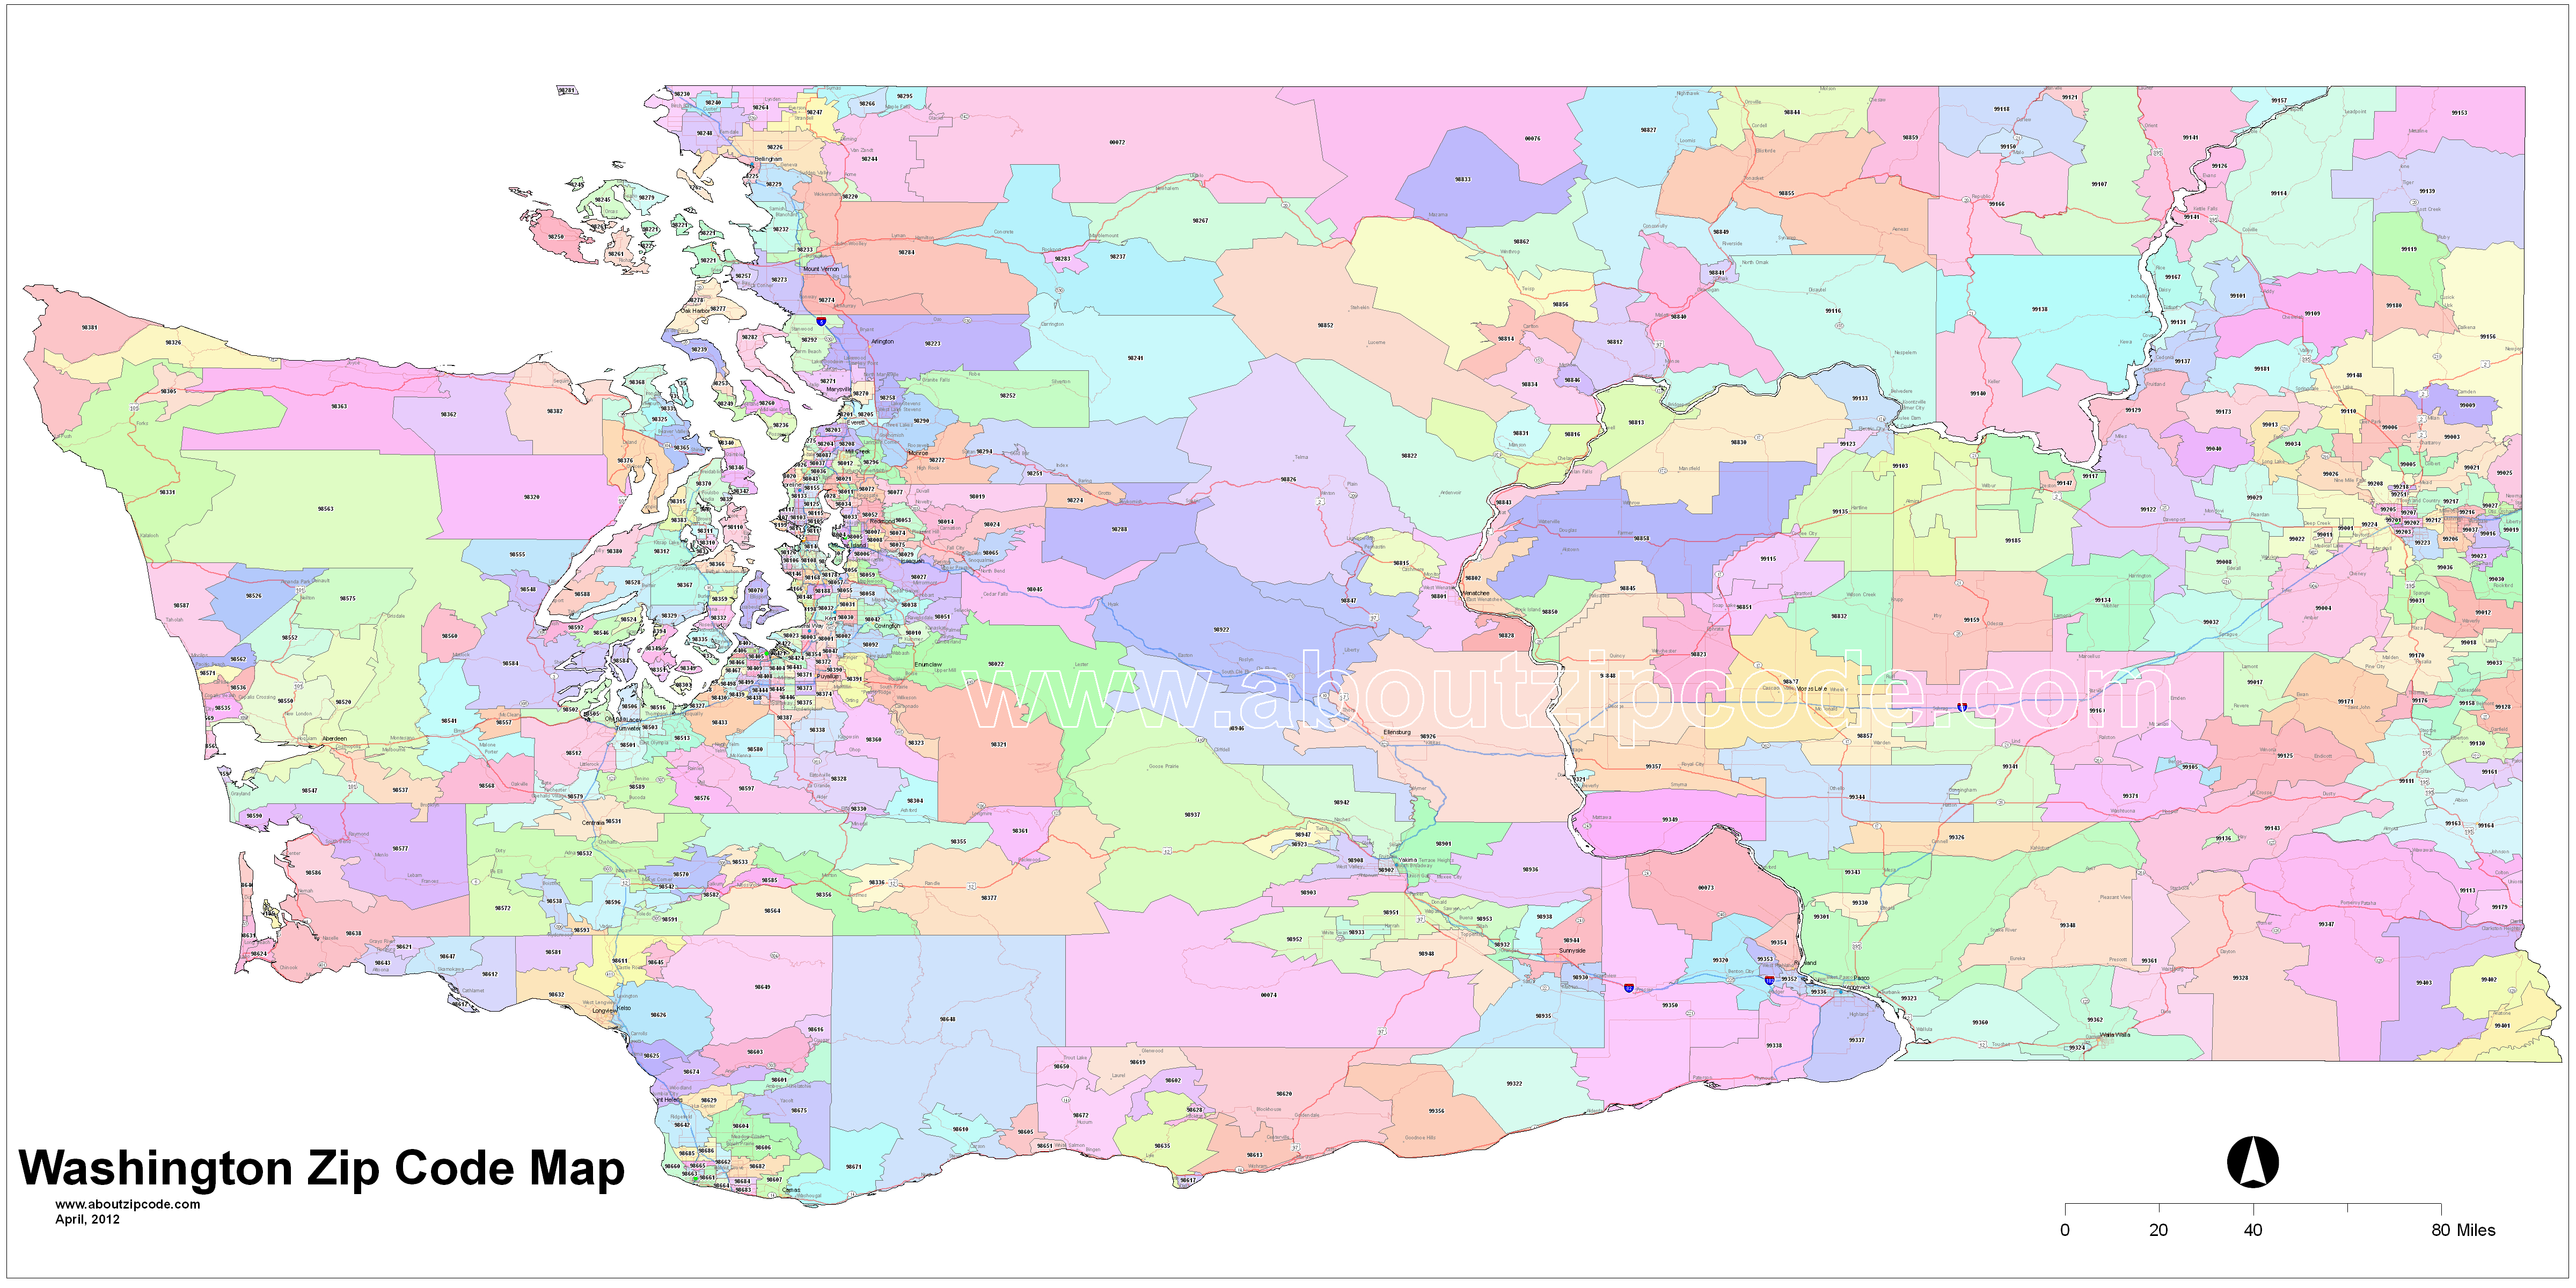 Washington Zip Code Maps - Free Washington Zip Code Maps - Free Printable Zip Code Maps